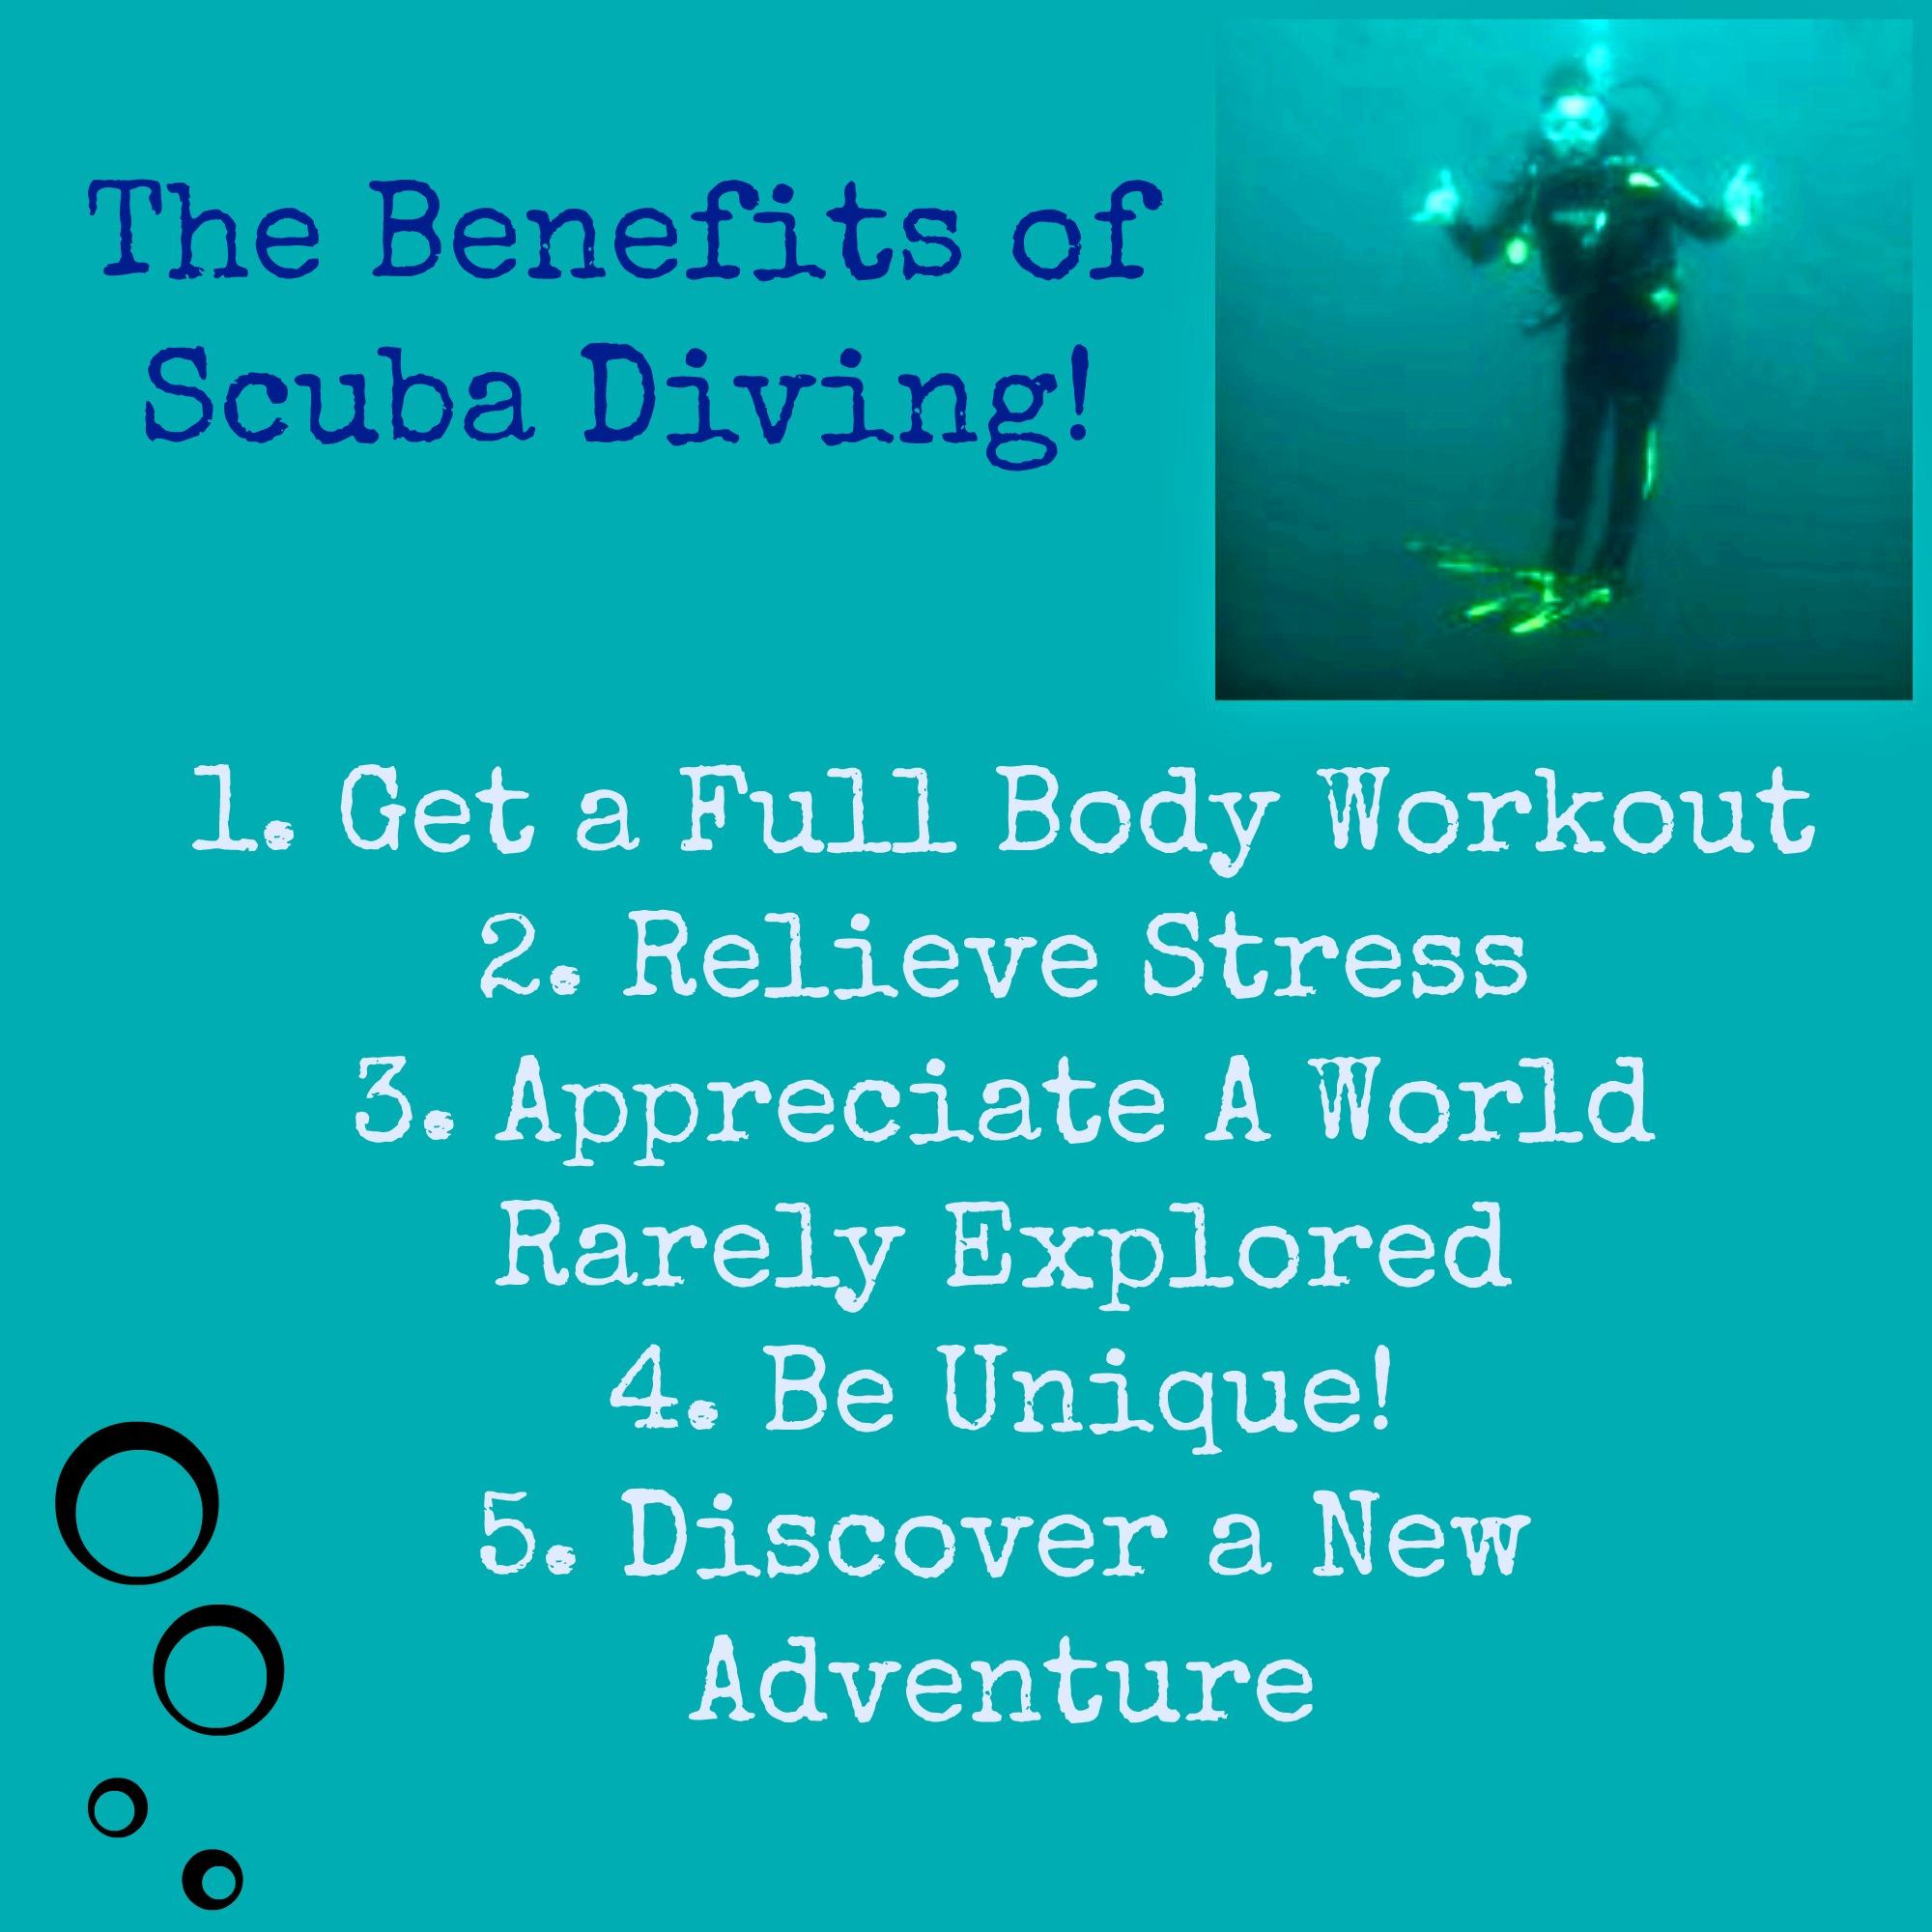 Top 5 Benefits Of Scuba Diving